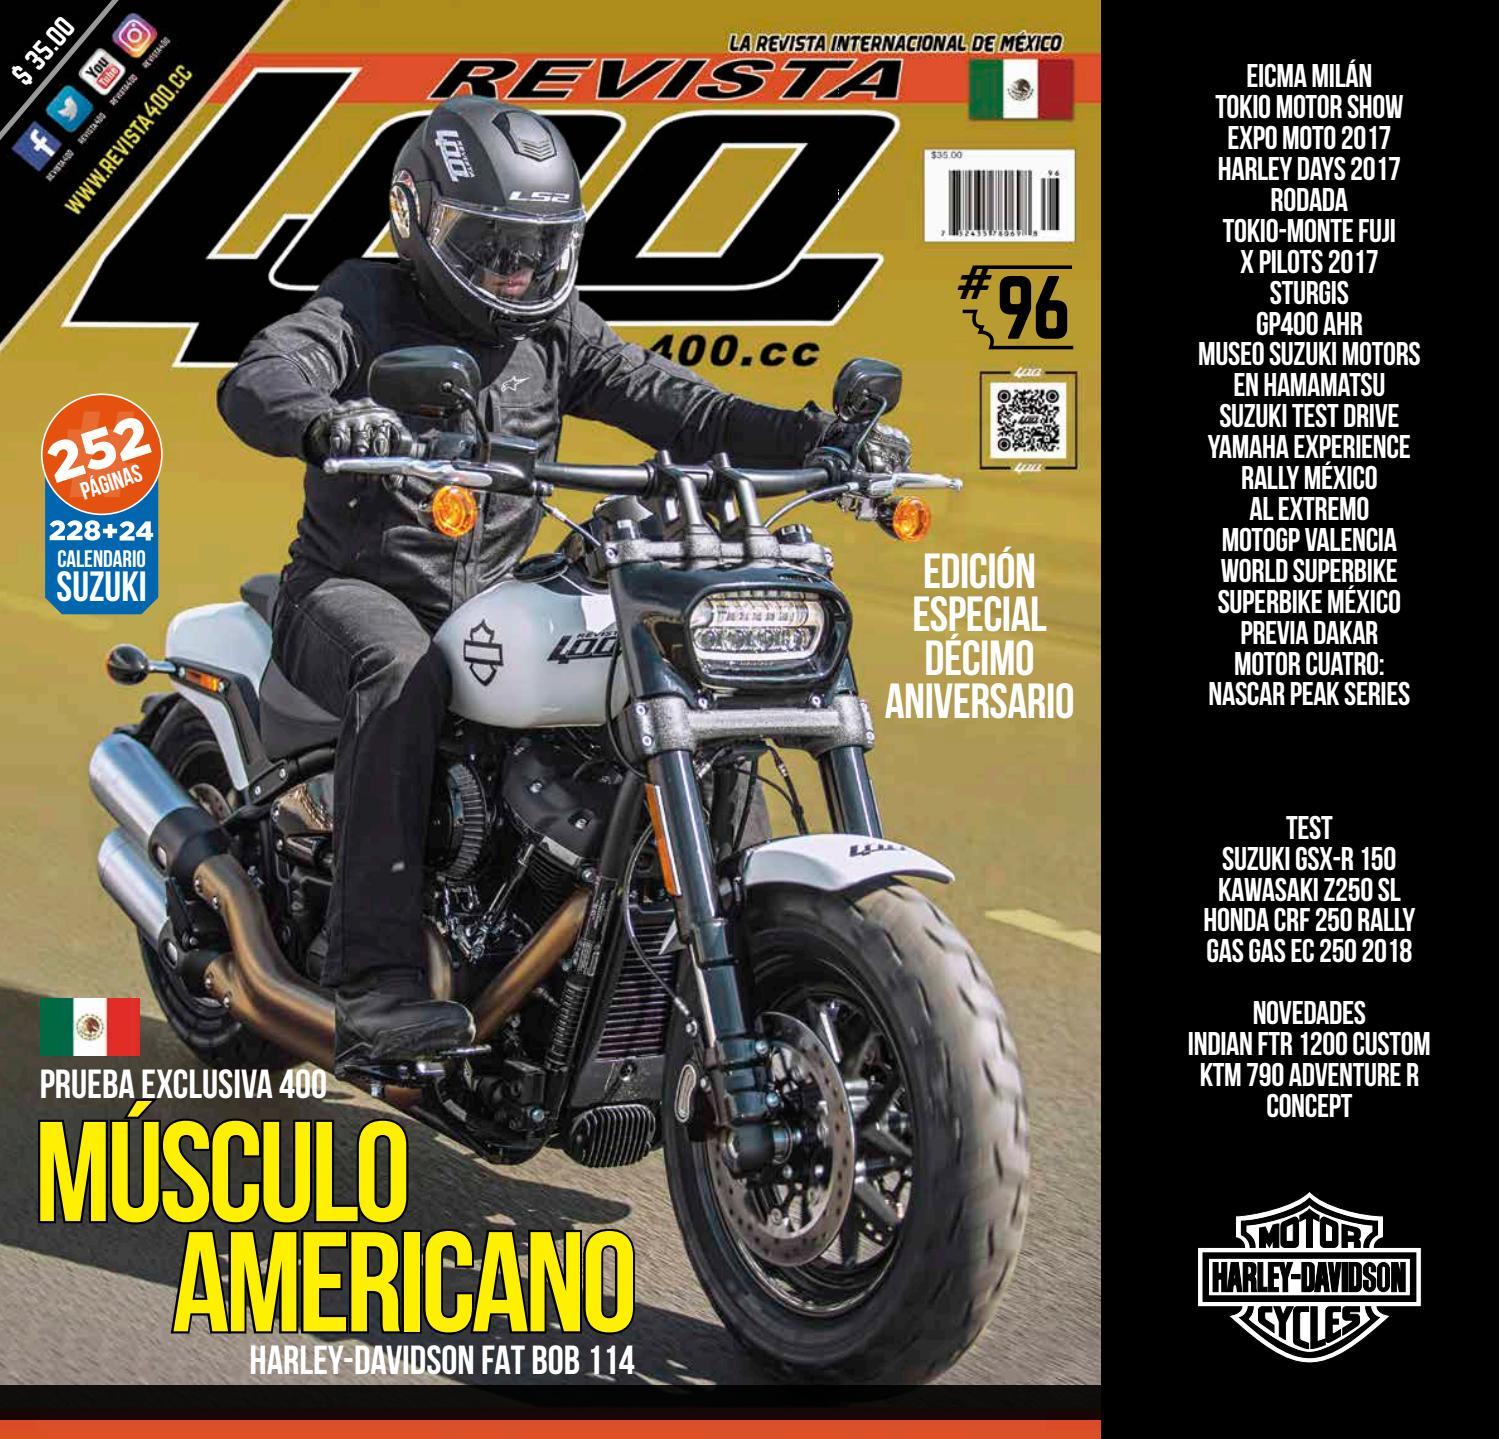 Negro C-FUN Guardabarros Trasero Guardabarros De La Motocicleta para Honda//Yamaha//Suzuki//Kawasaki//Chopper Cruiser